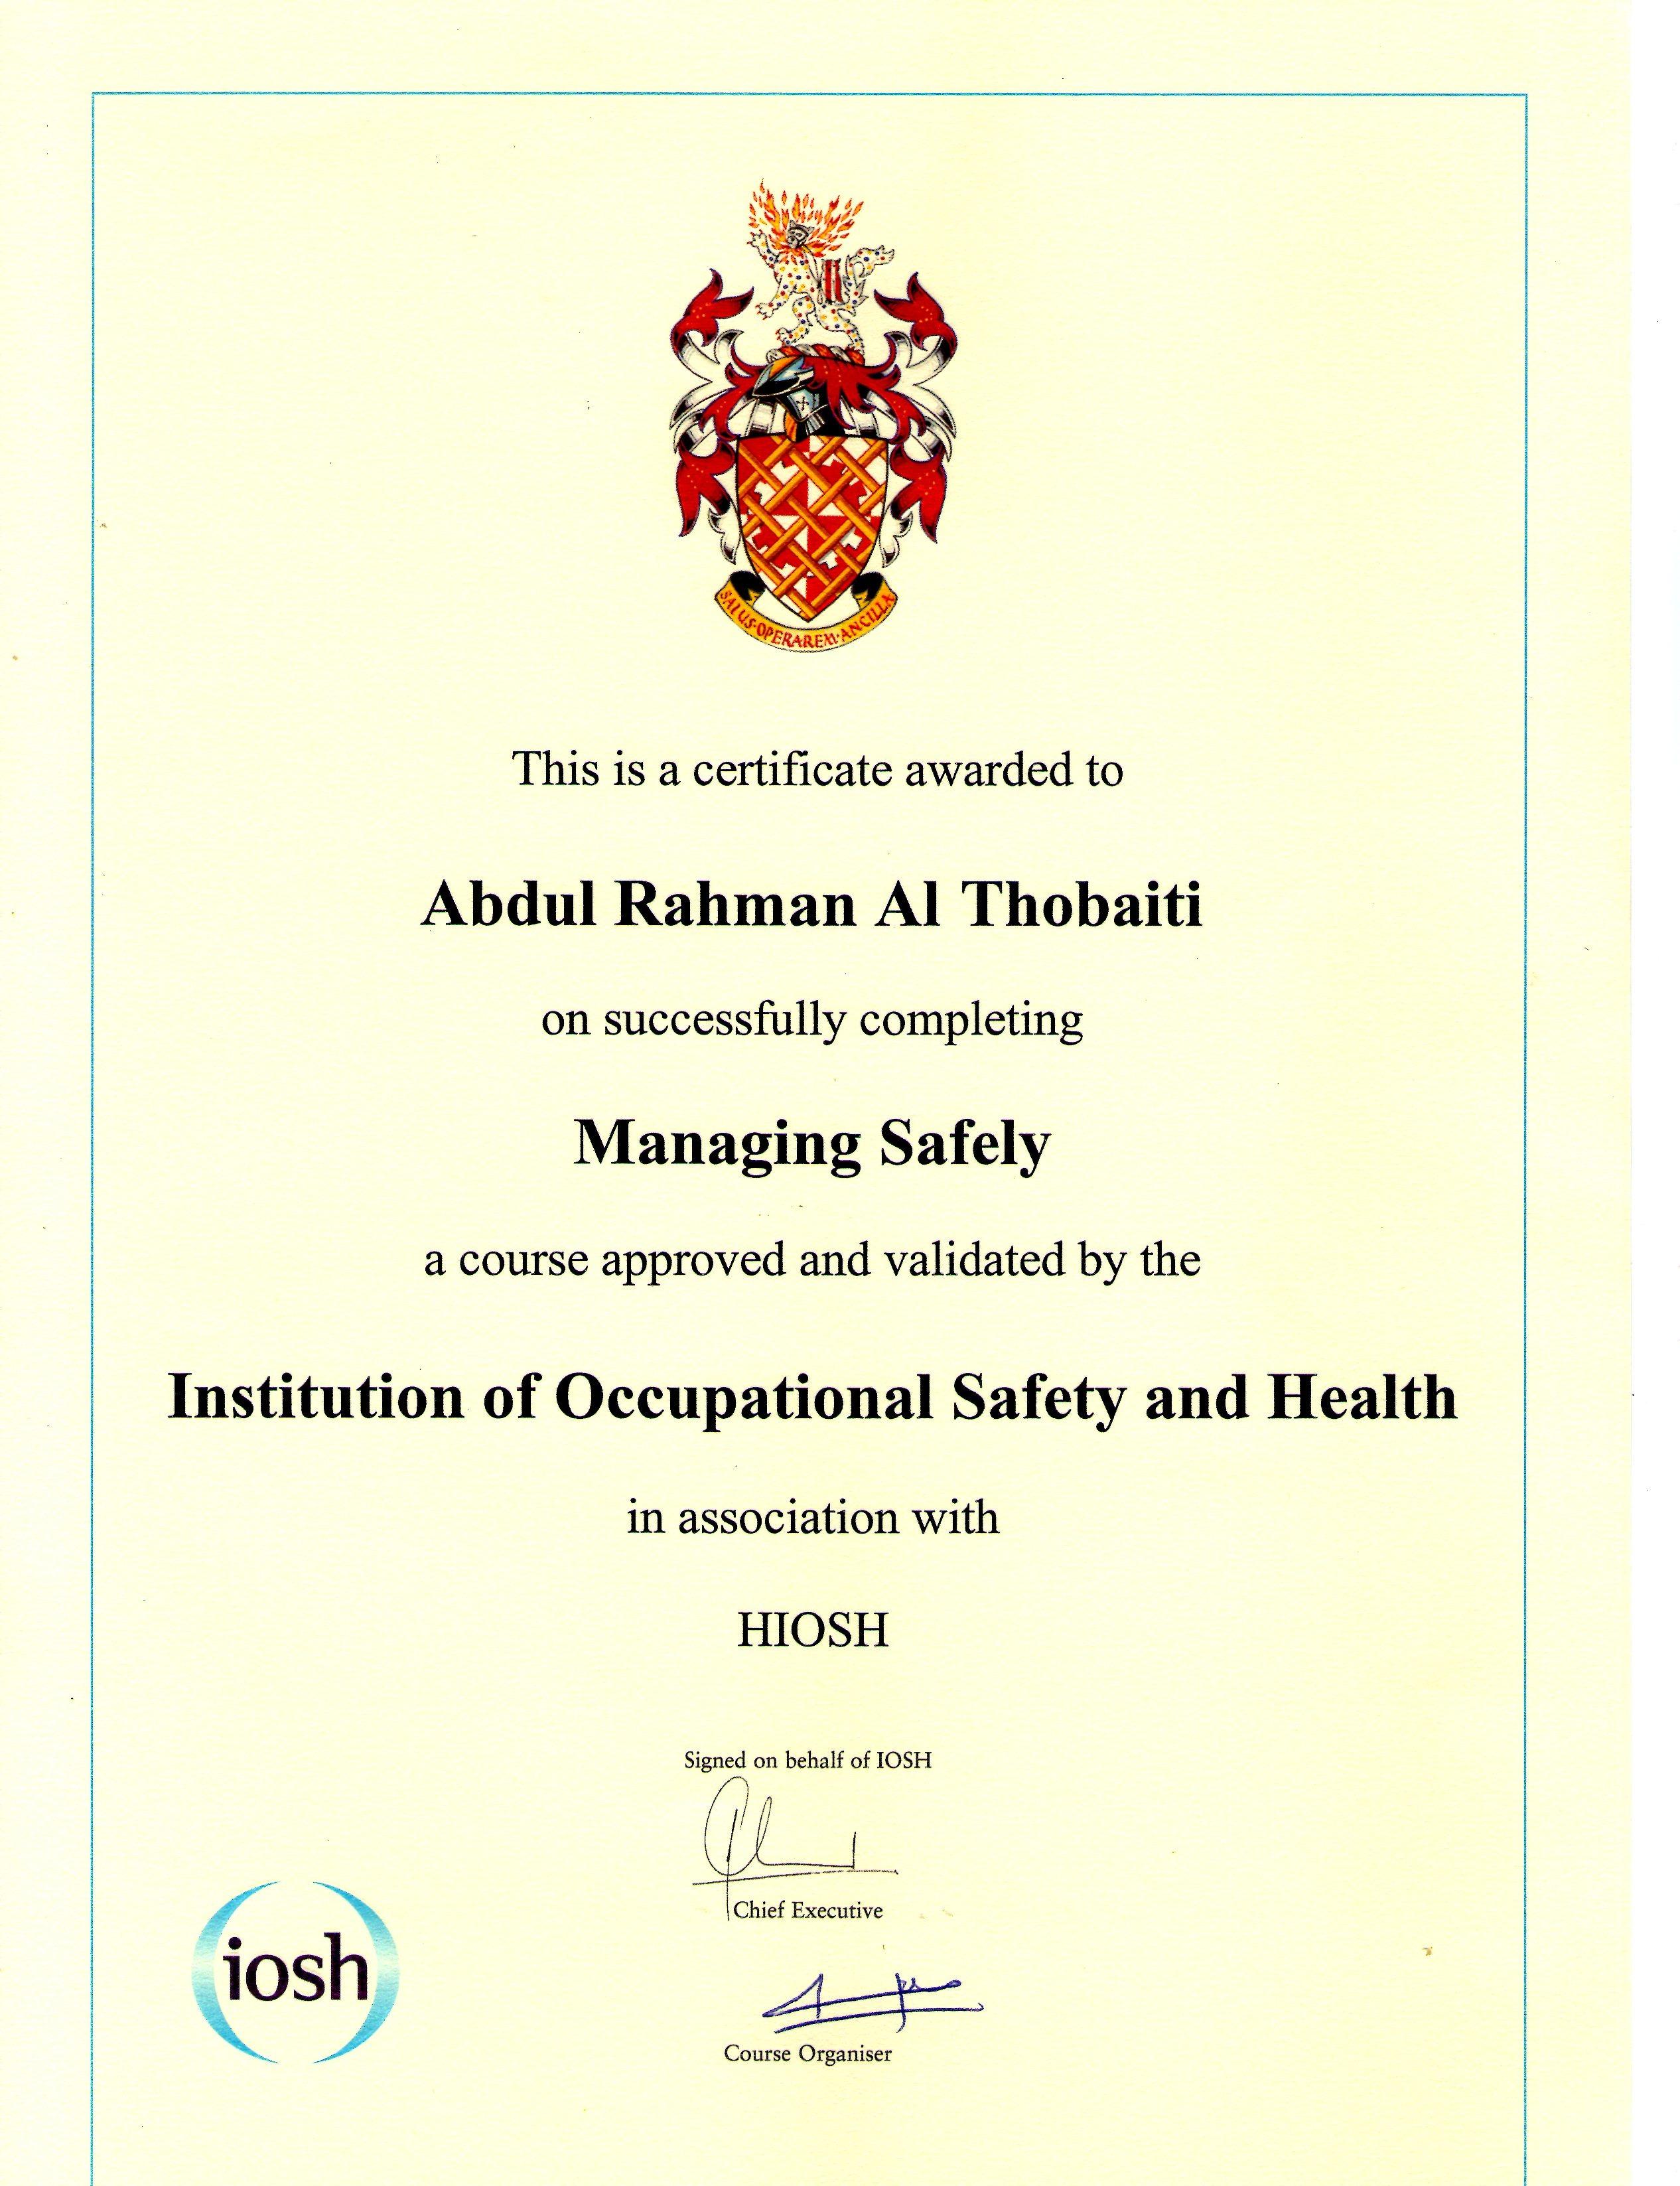 Abdulrahman althobaiti bayt iosh certificate managing safely certificate xflitez Choice Image